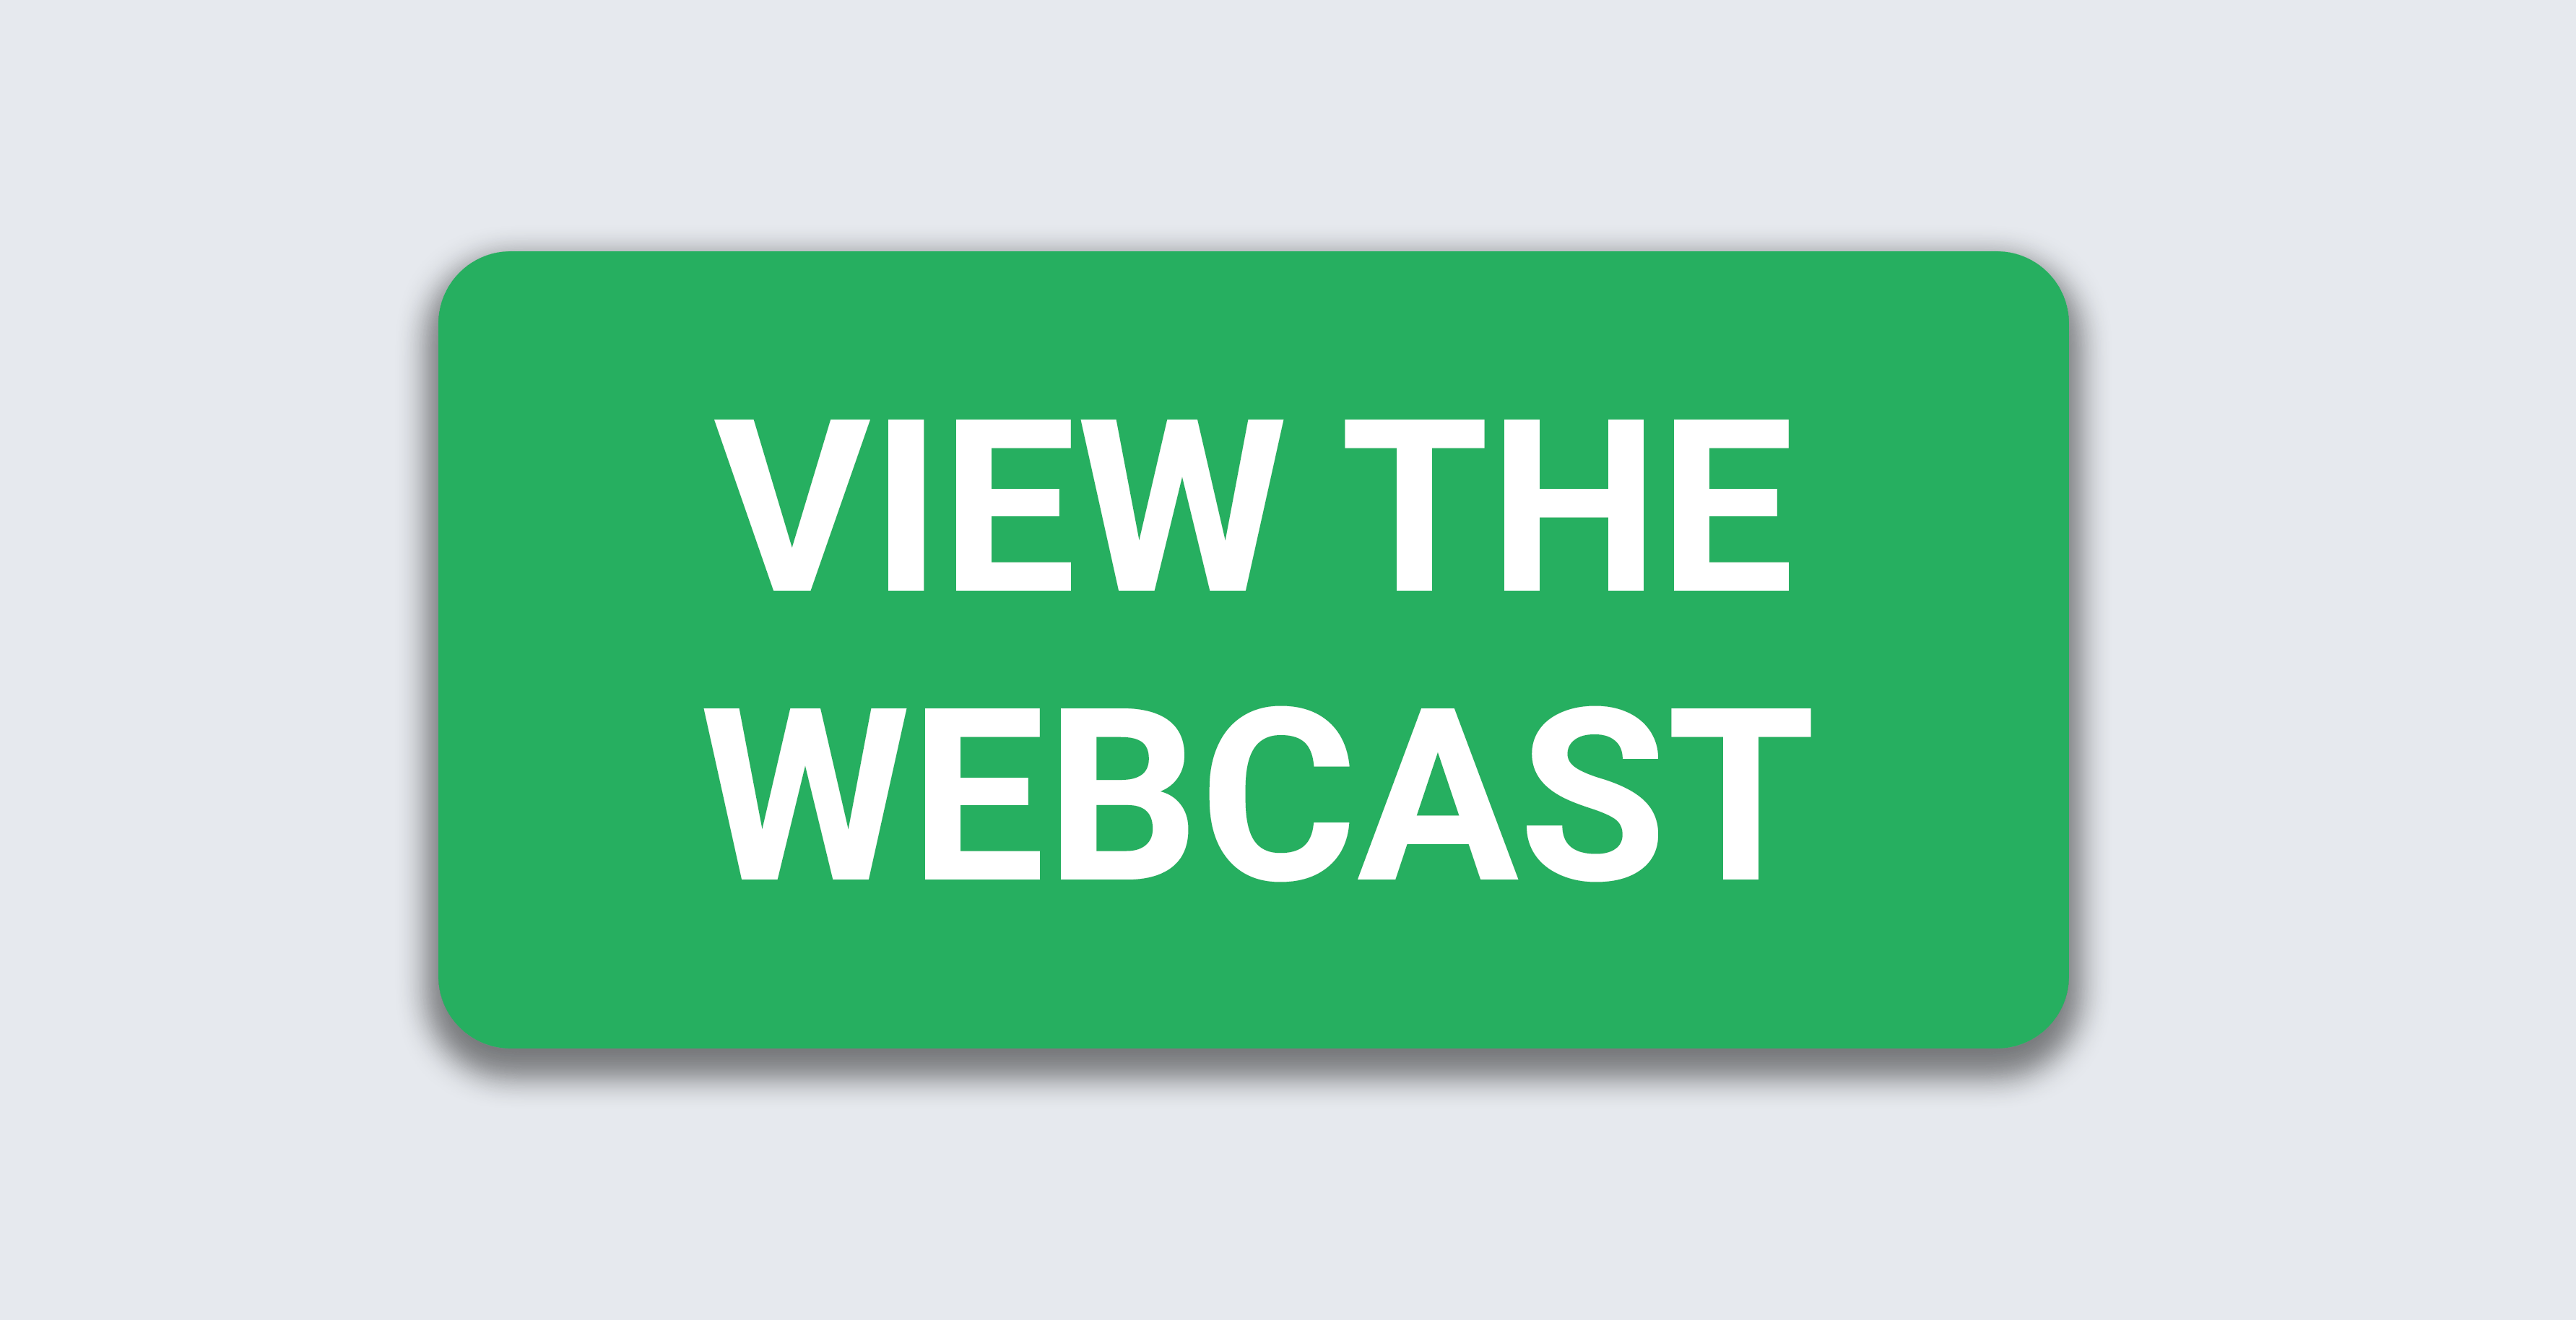 View Webcast Button 1.png